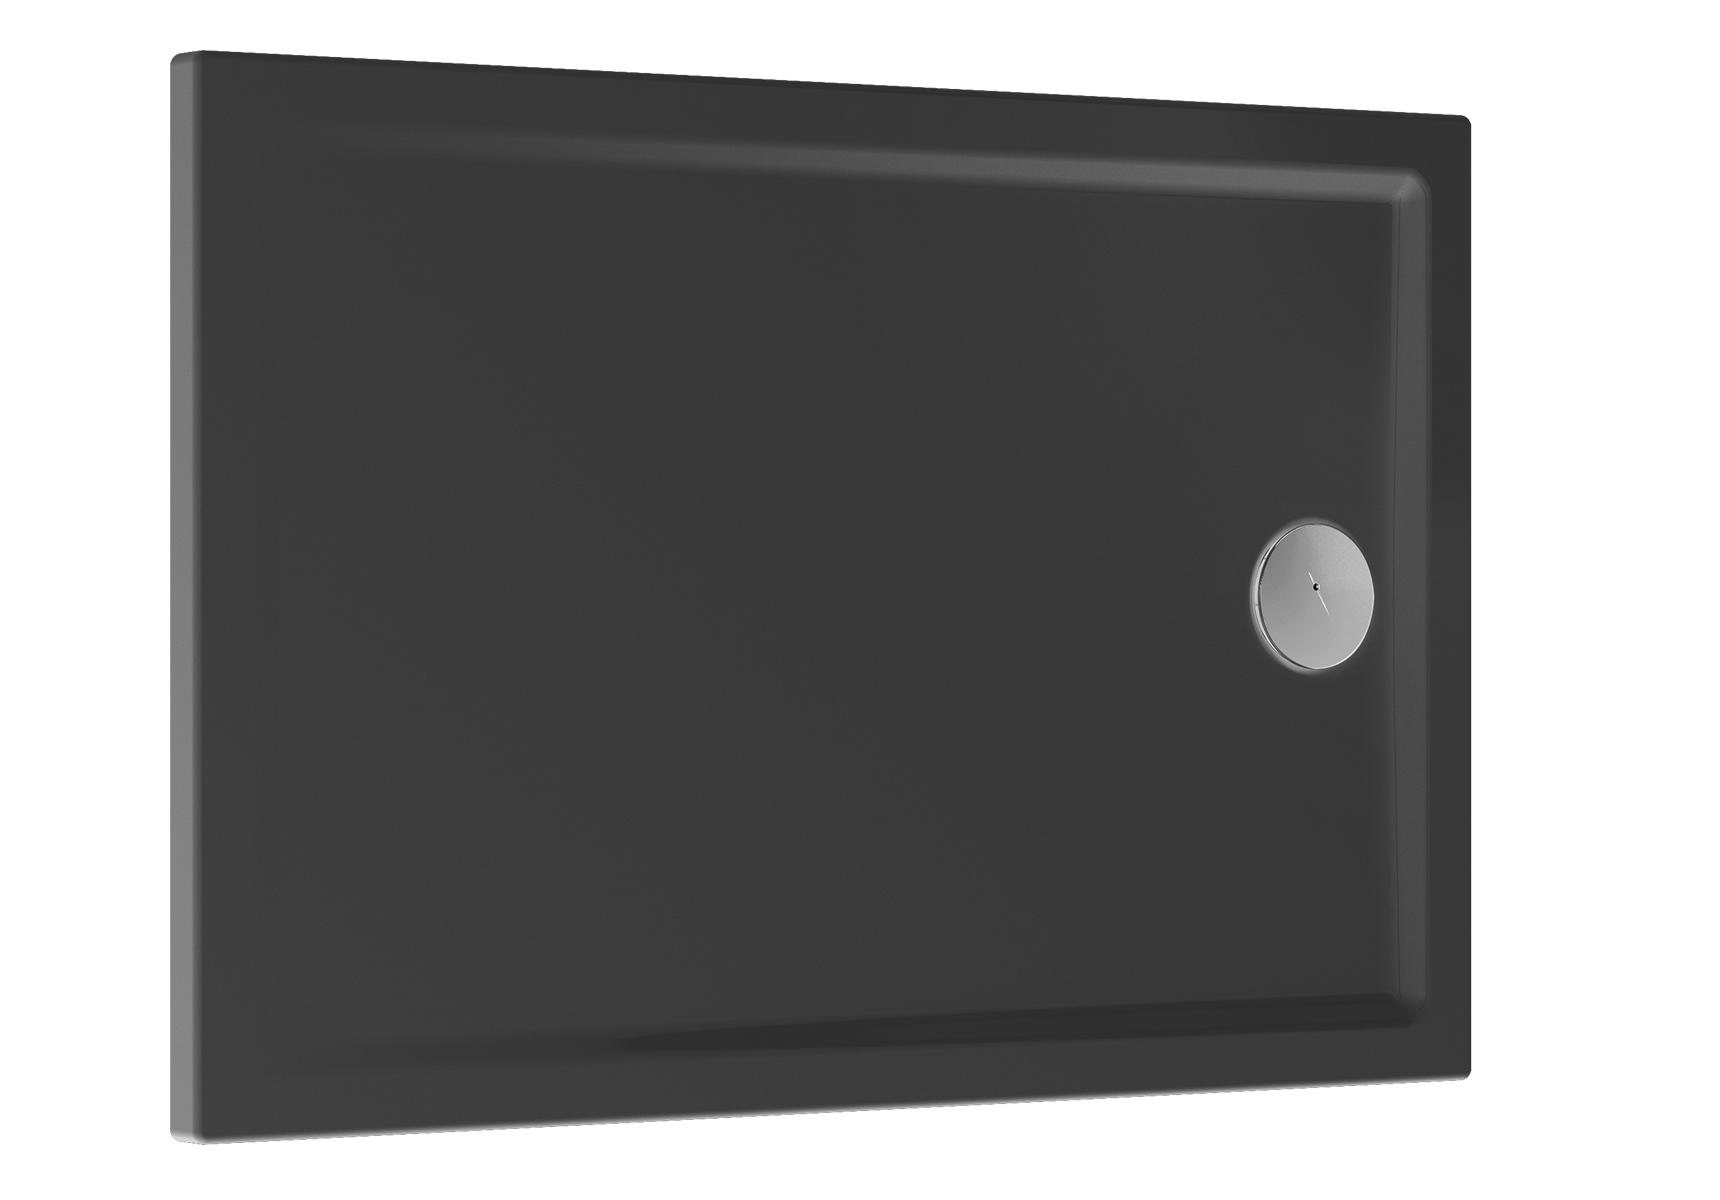 Cascade receveur ultra plat en céramique, 140  x  90 cm, anthraciteacite